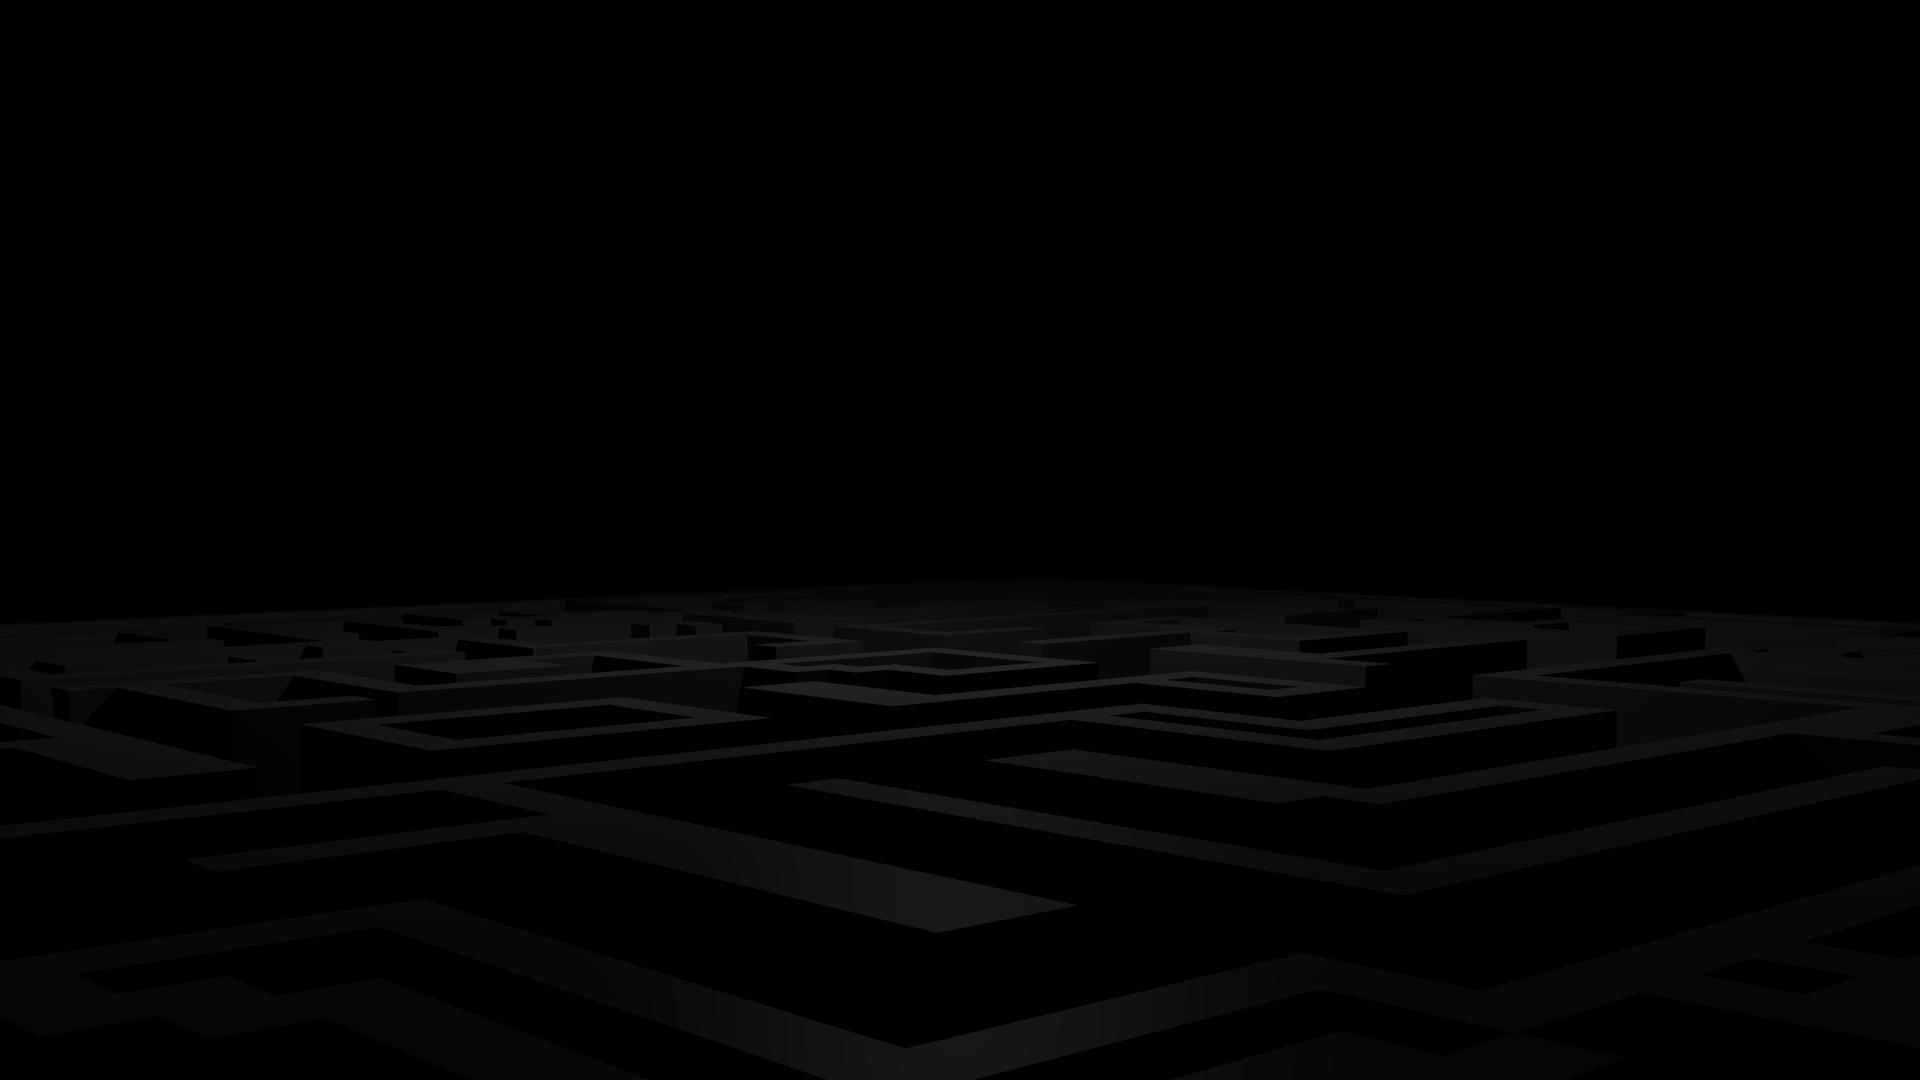 Hd dark wallpapers wallpaper cave - Dark background wallpaper hd ...